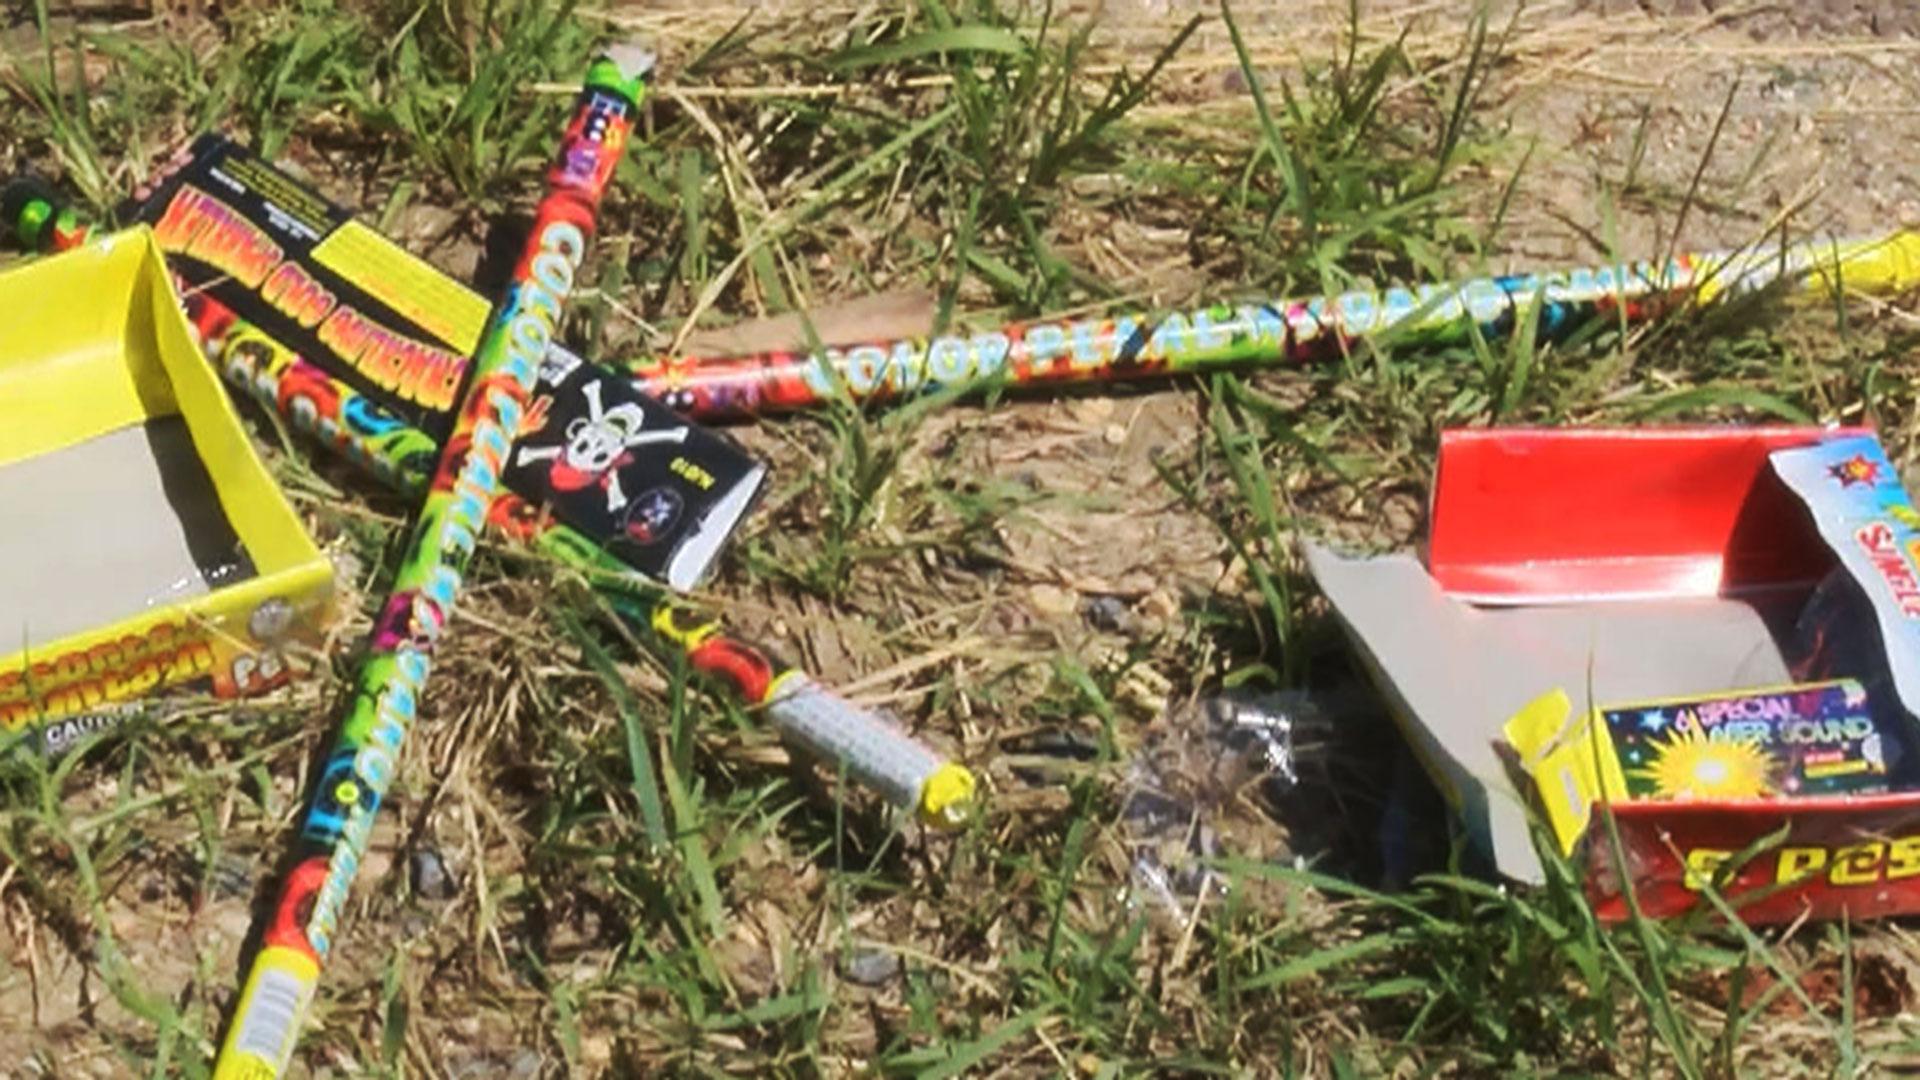 KELO fireworks trash rockets litter